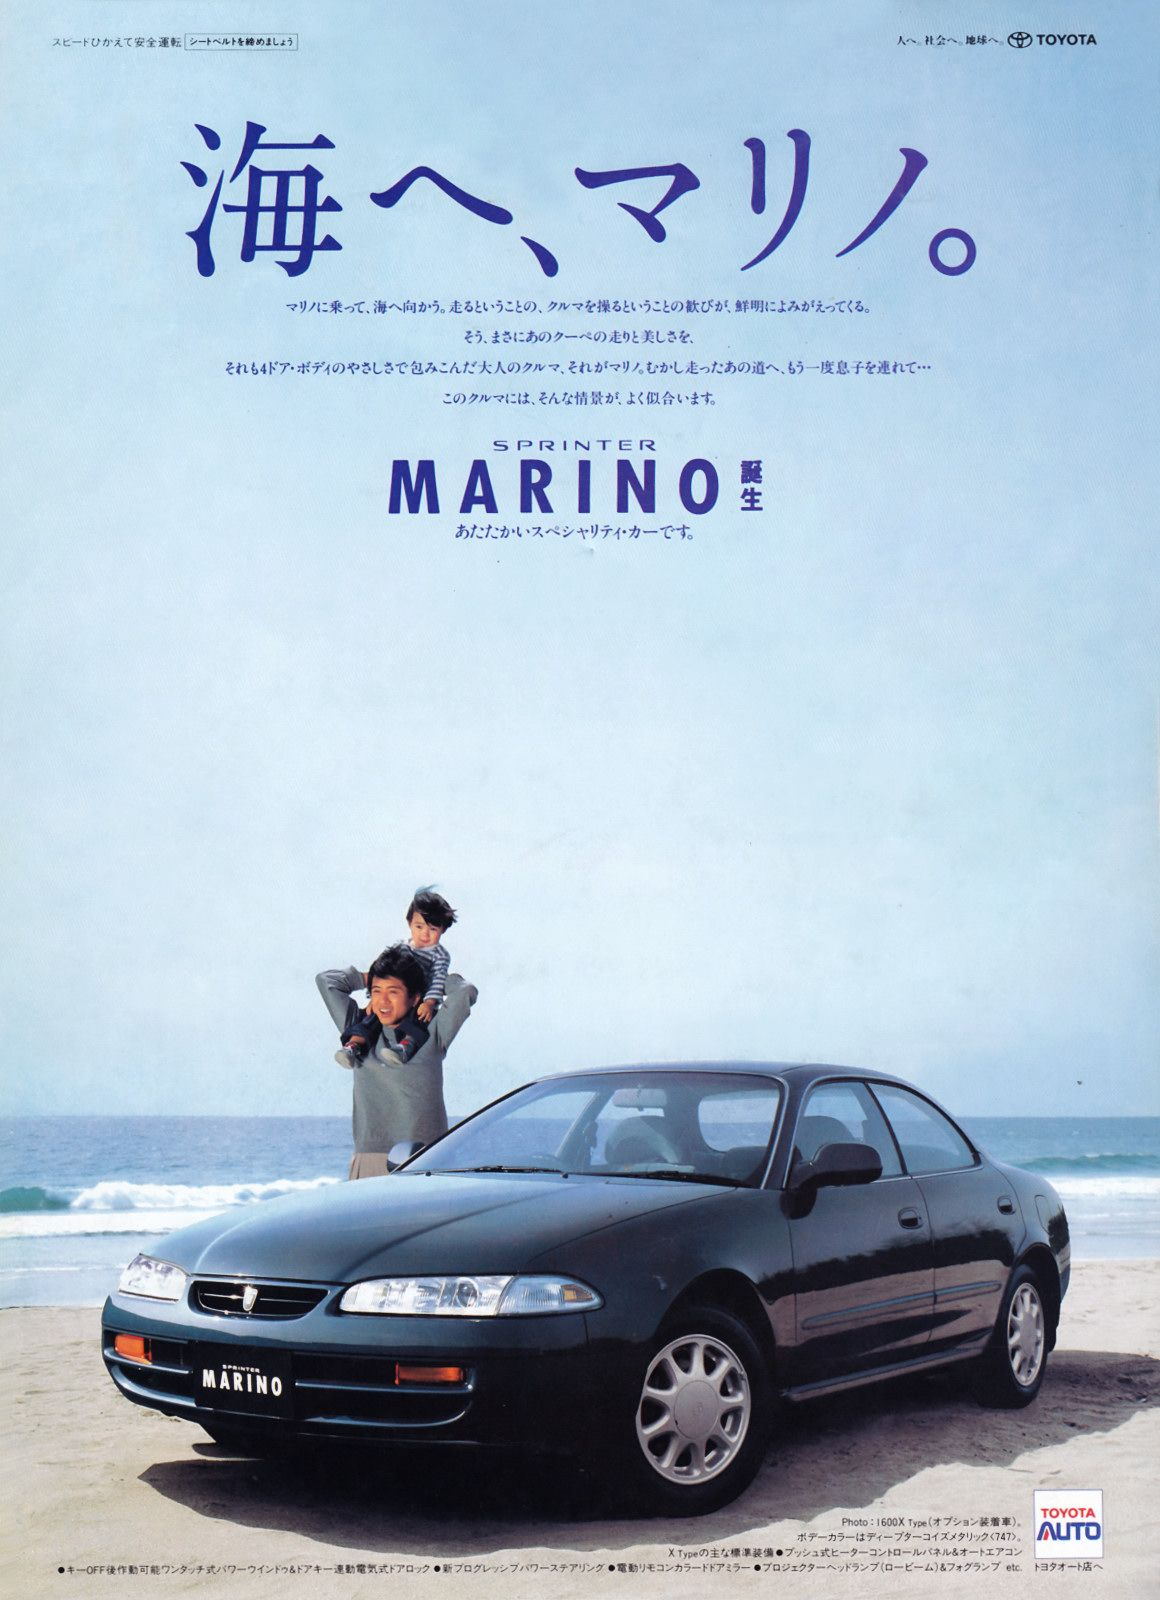 Toyota マリノ 1992年 旧車 トヨタ 古い車